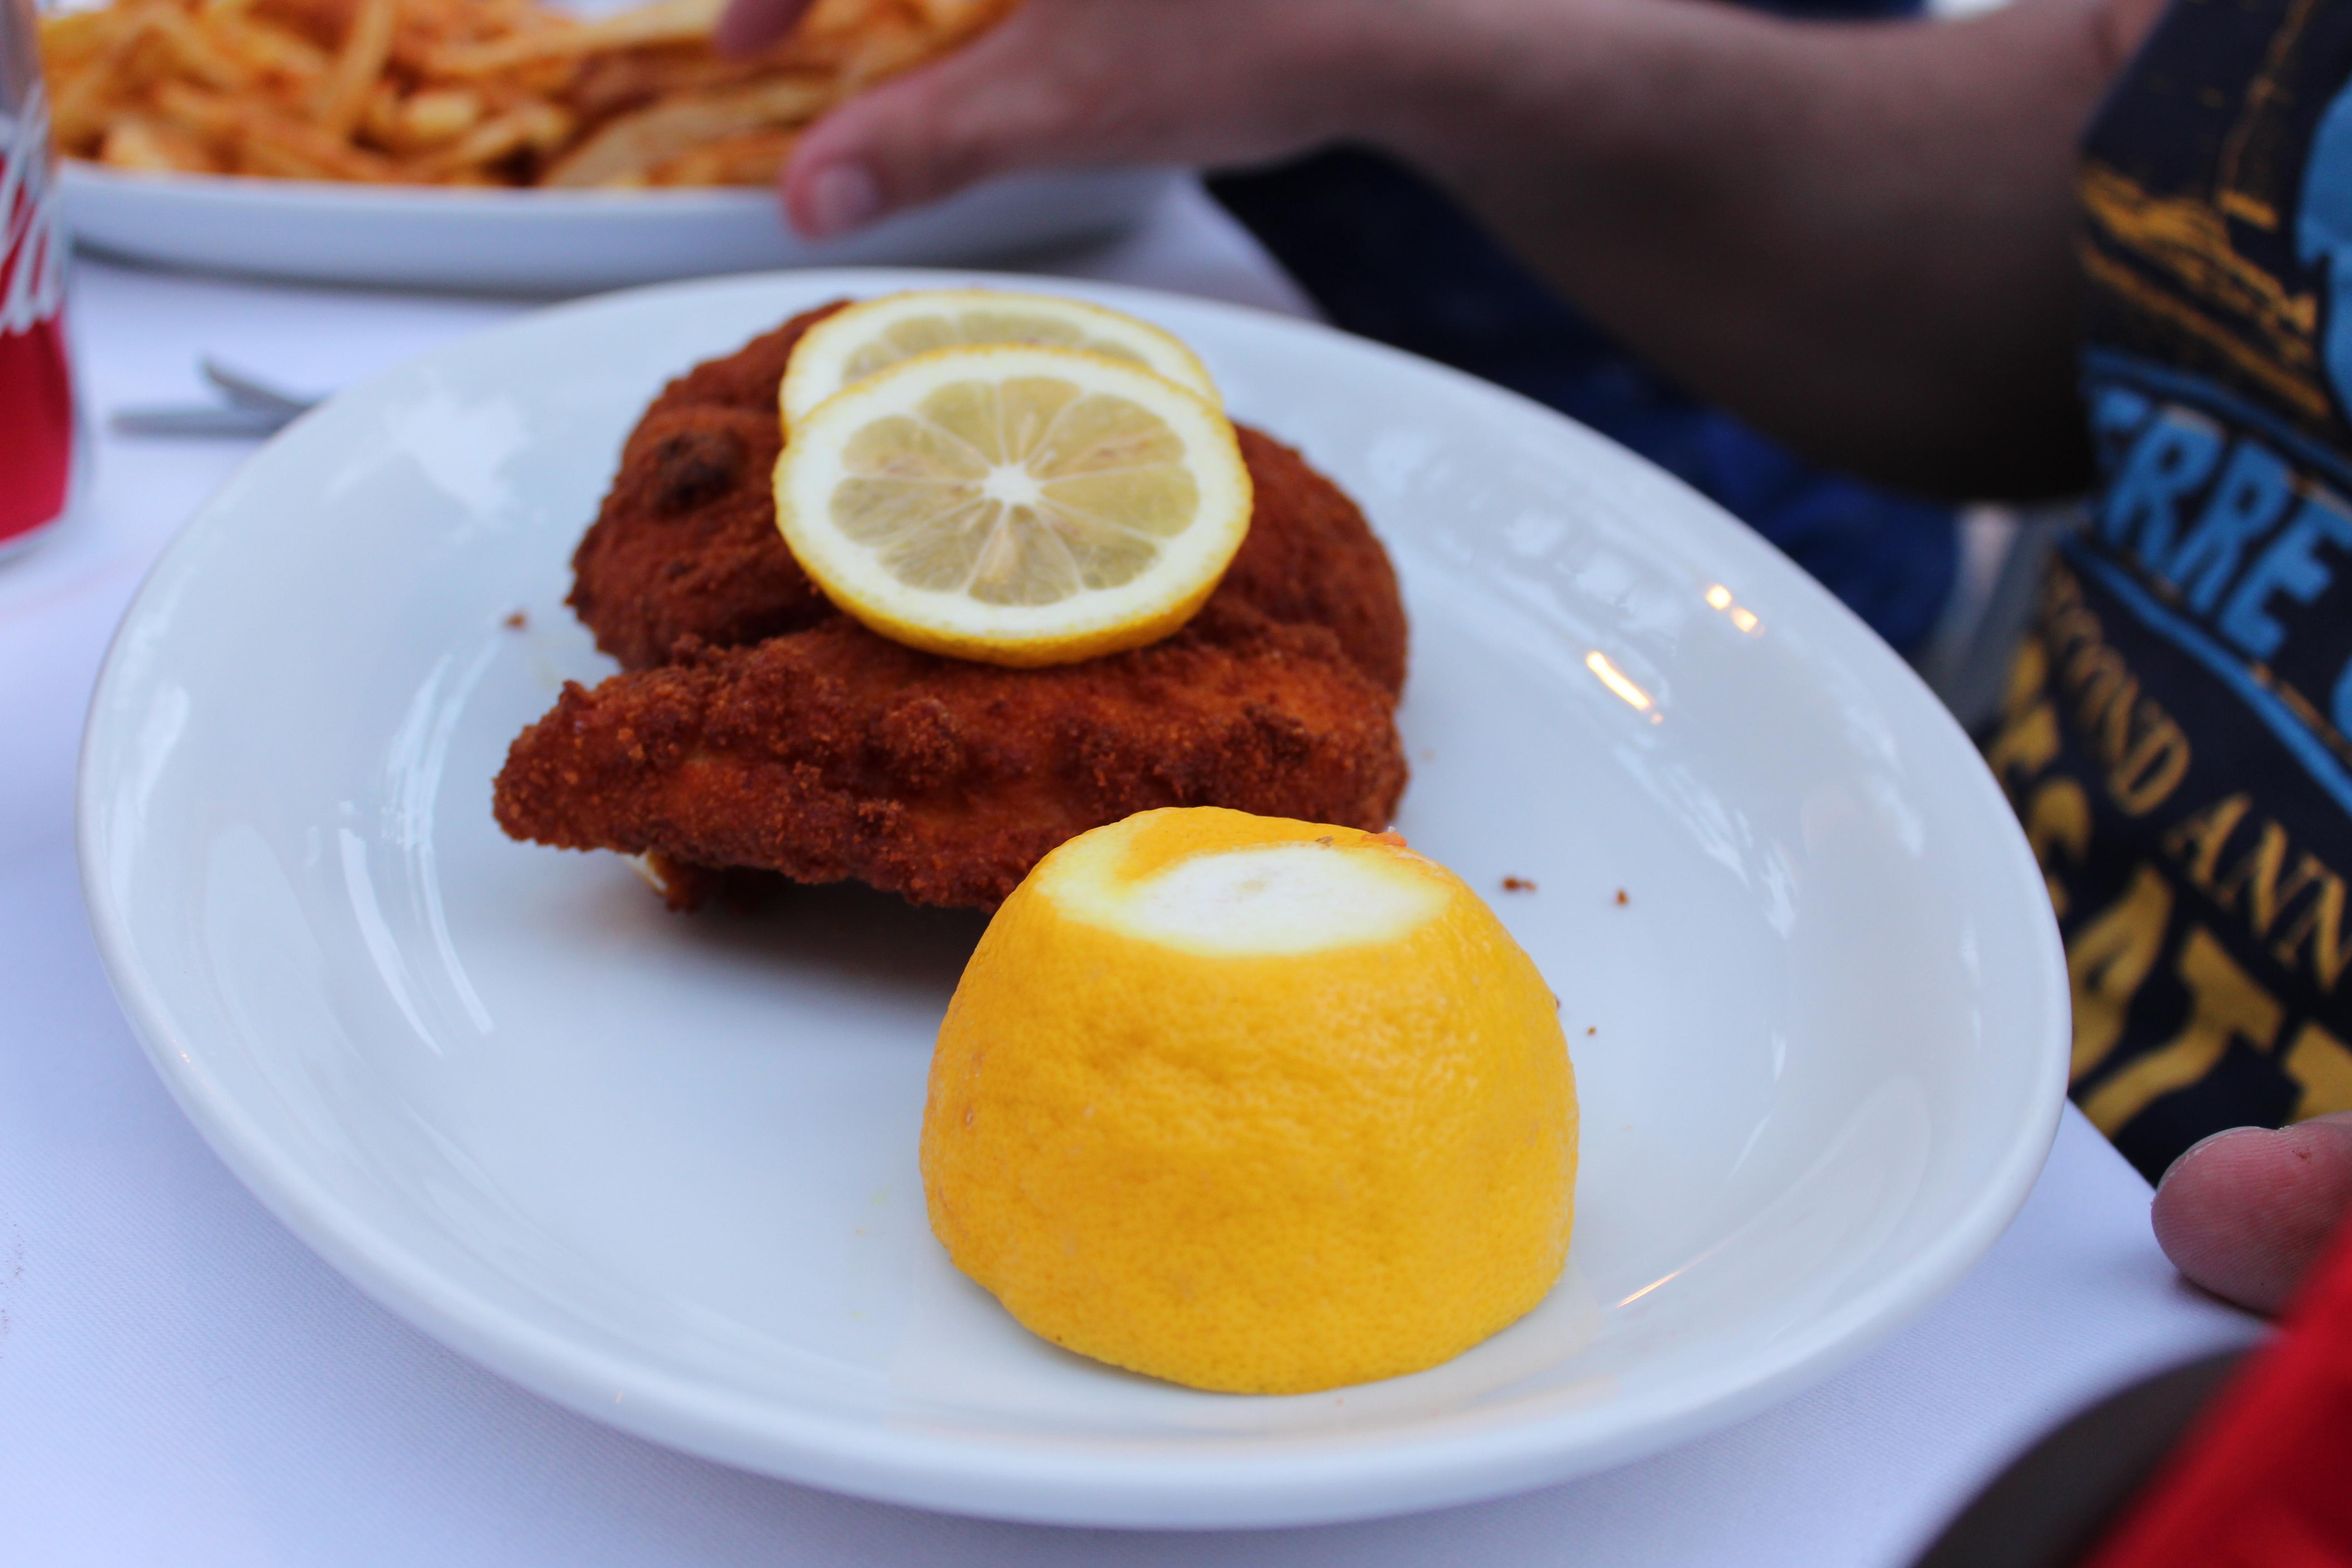 restaurants in stoupa melissa (chickenschnitzel)